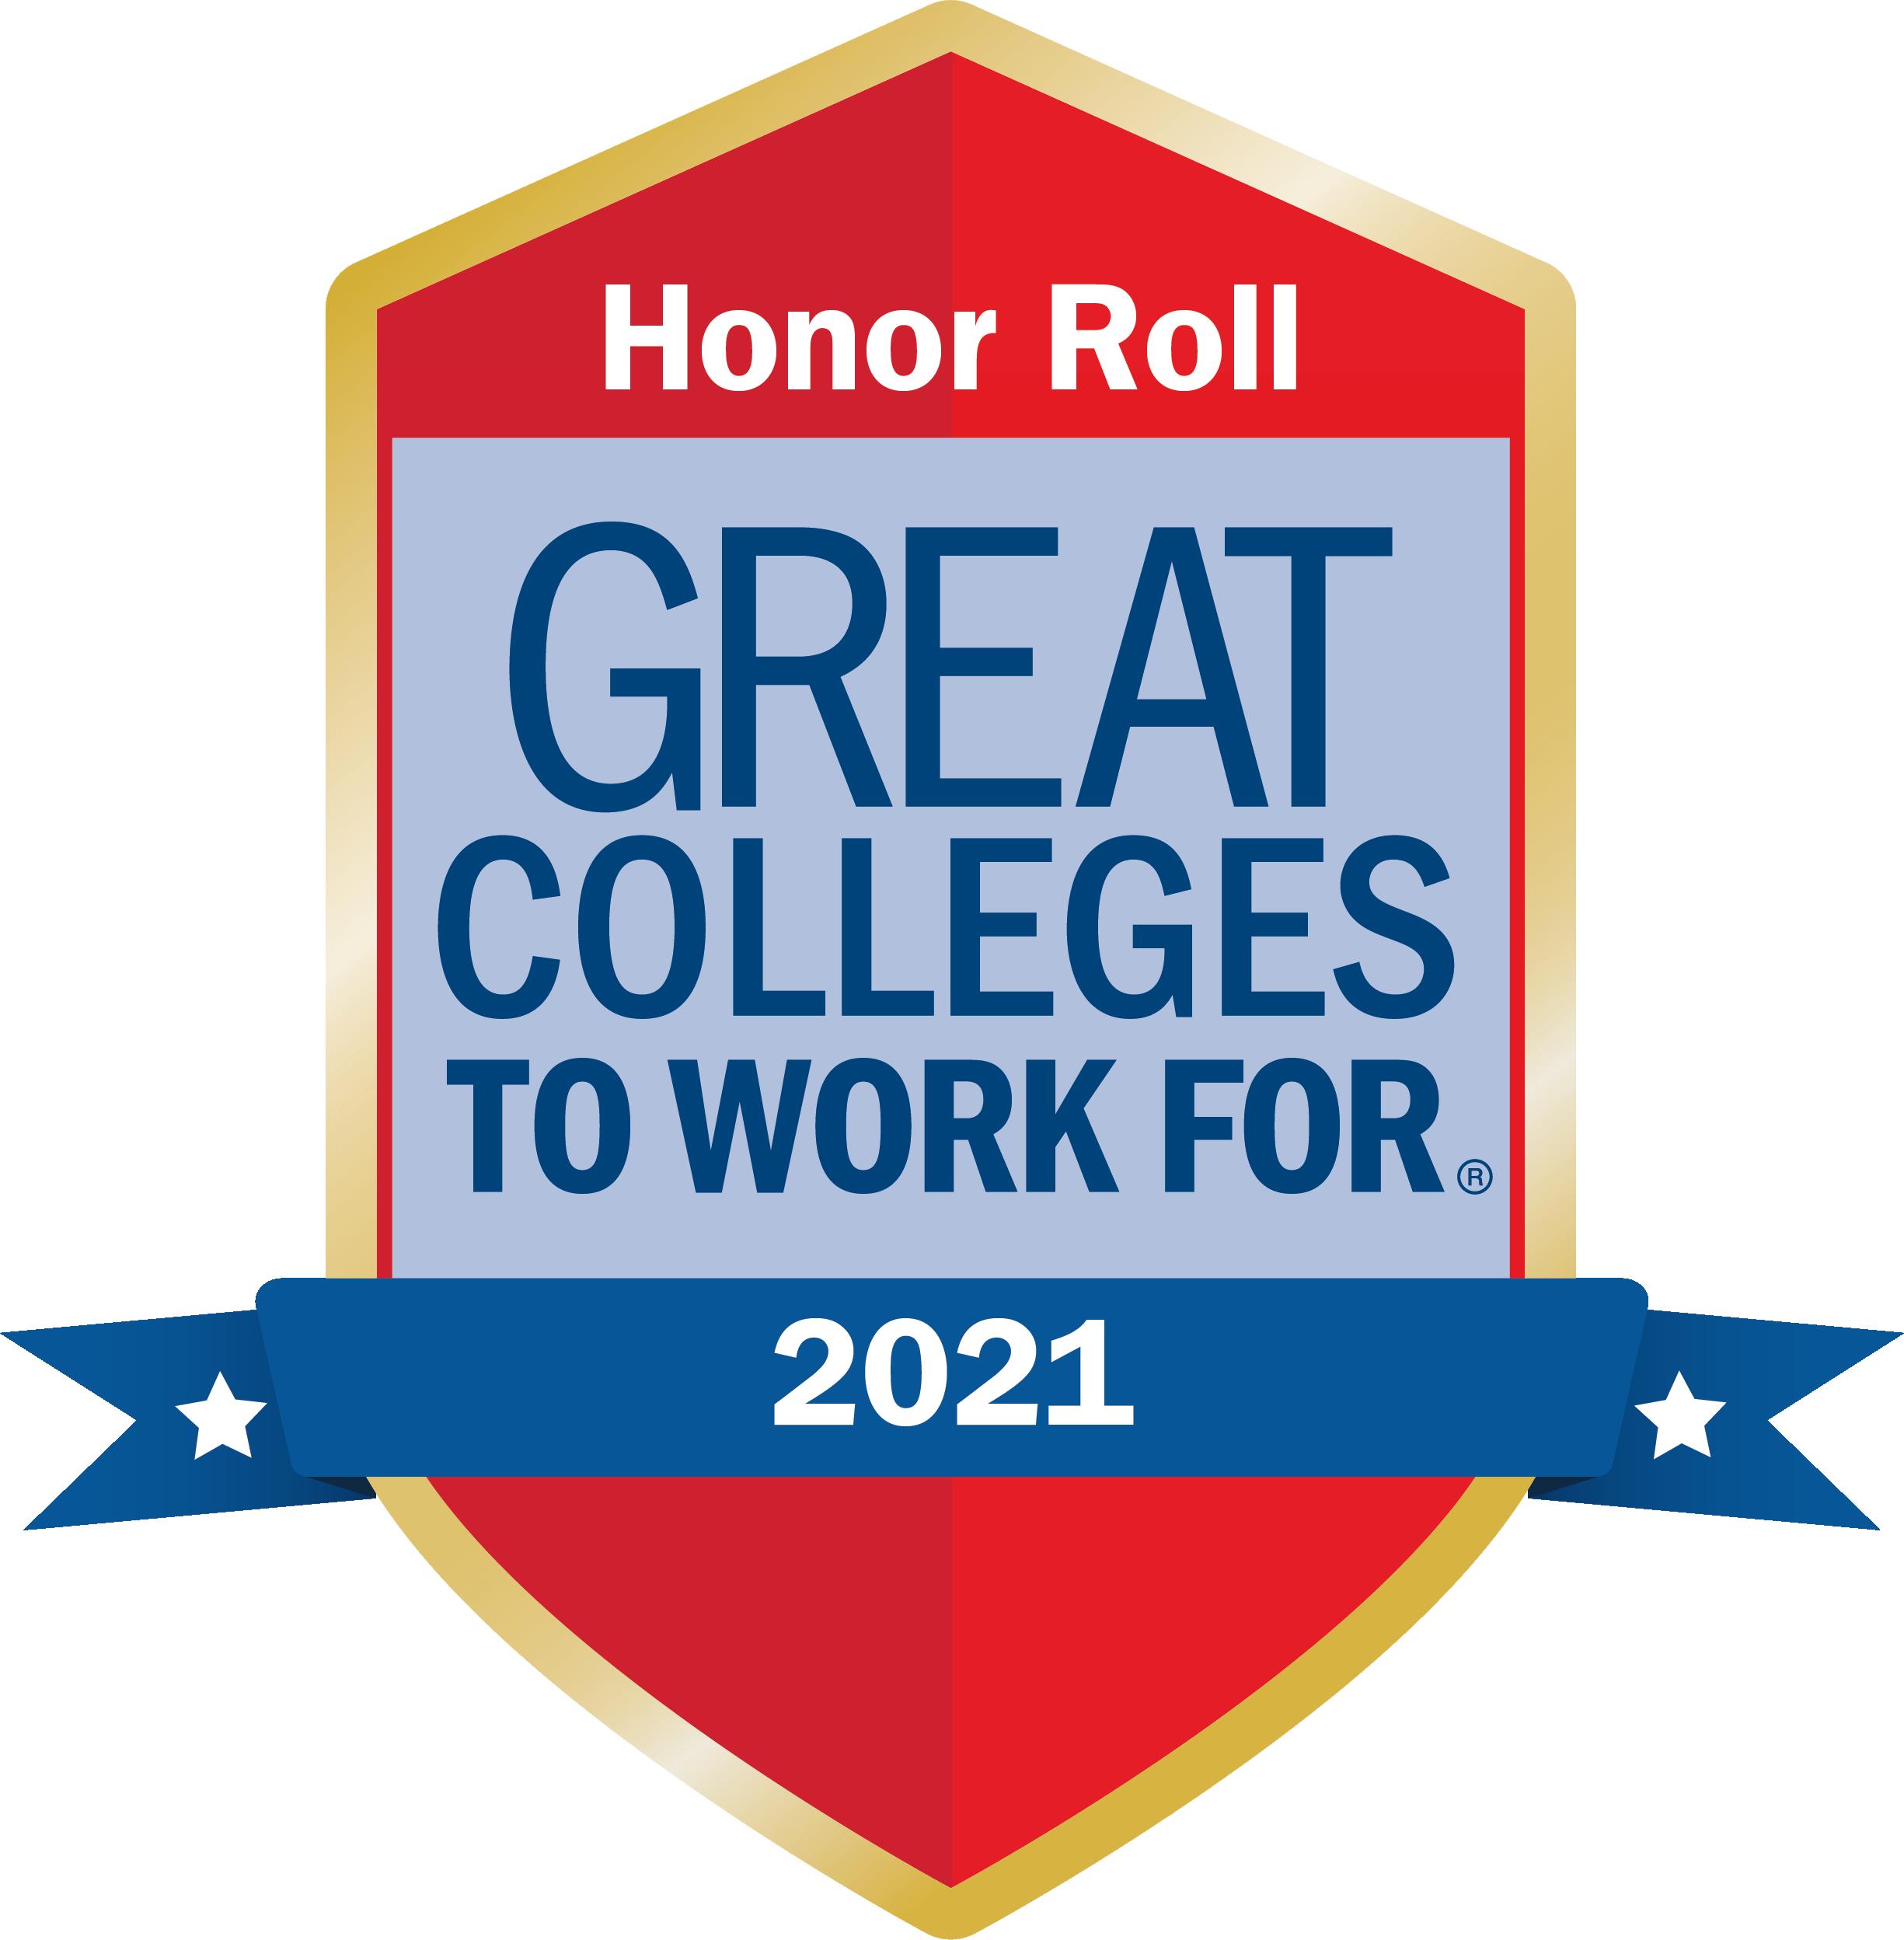 2021 Honor Roll Logo